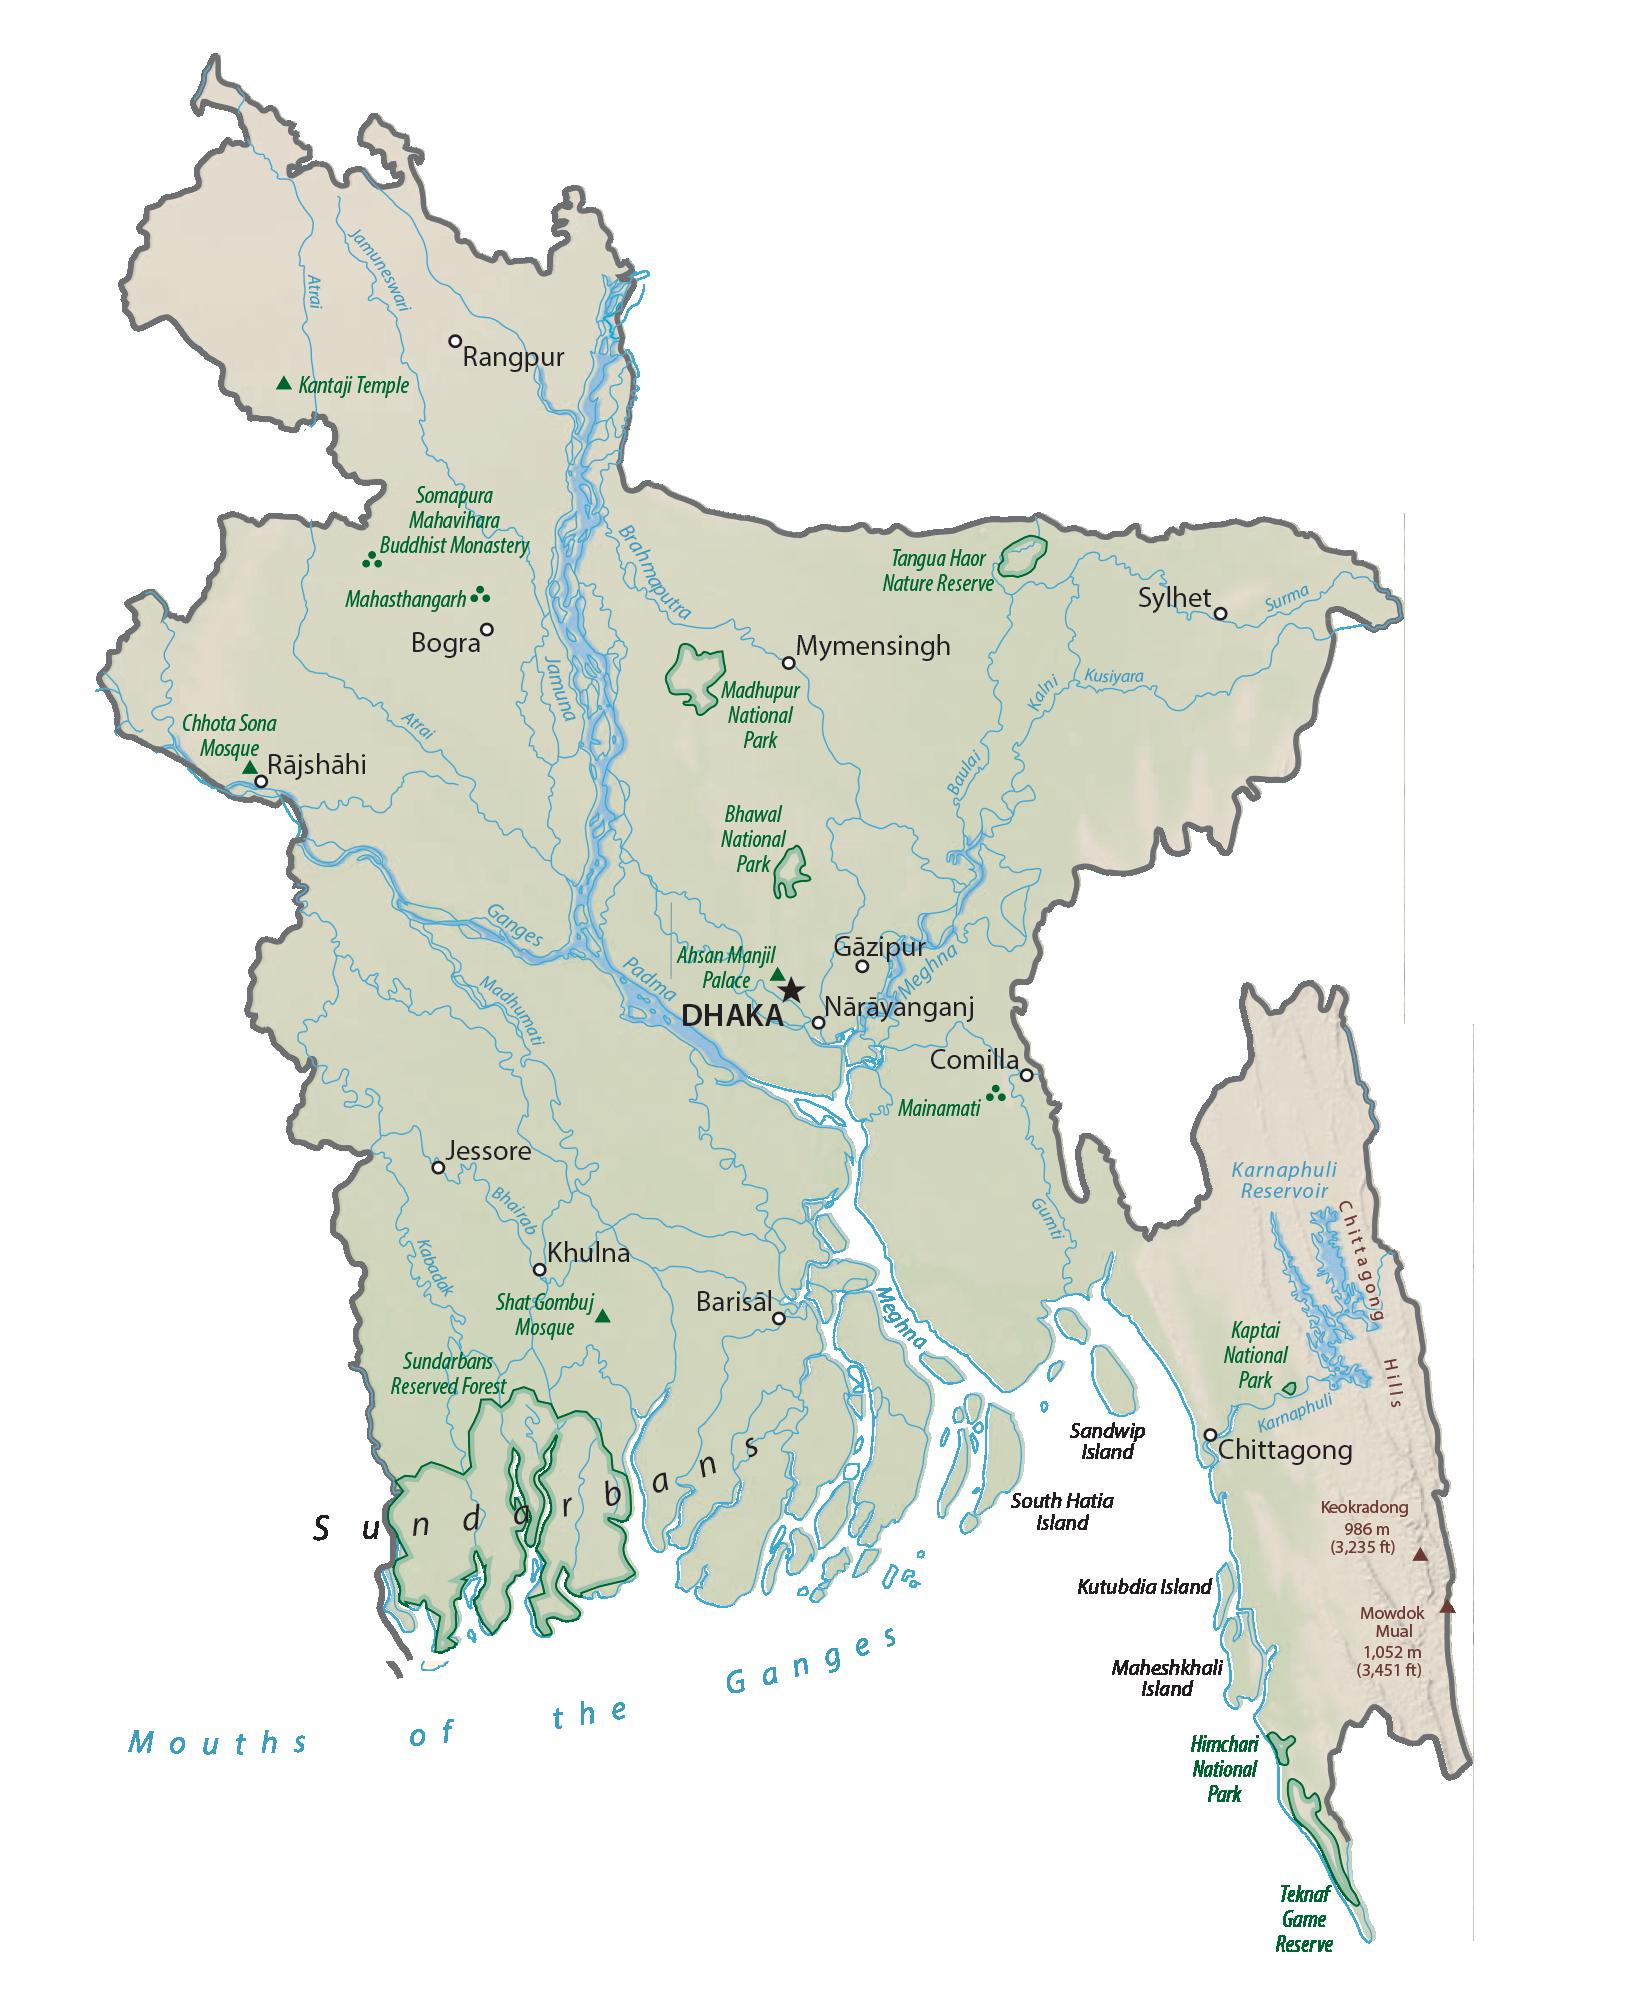 Bangladesh Physical Map